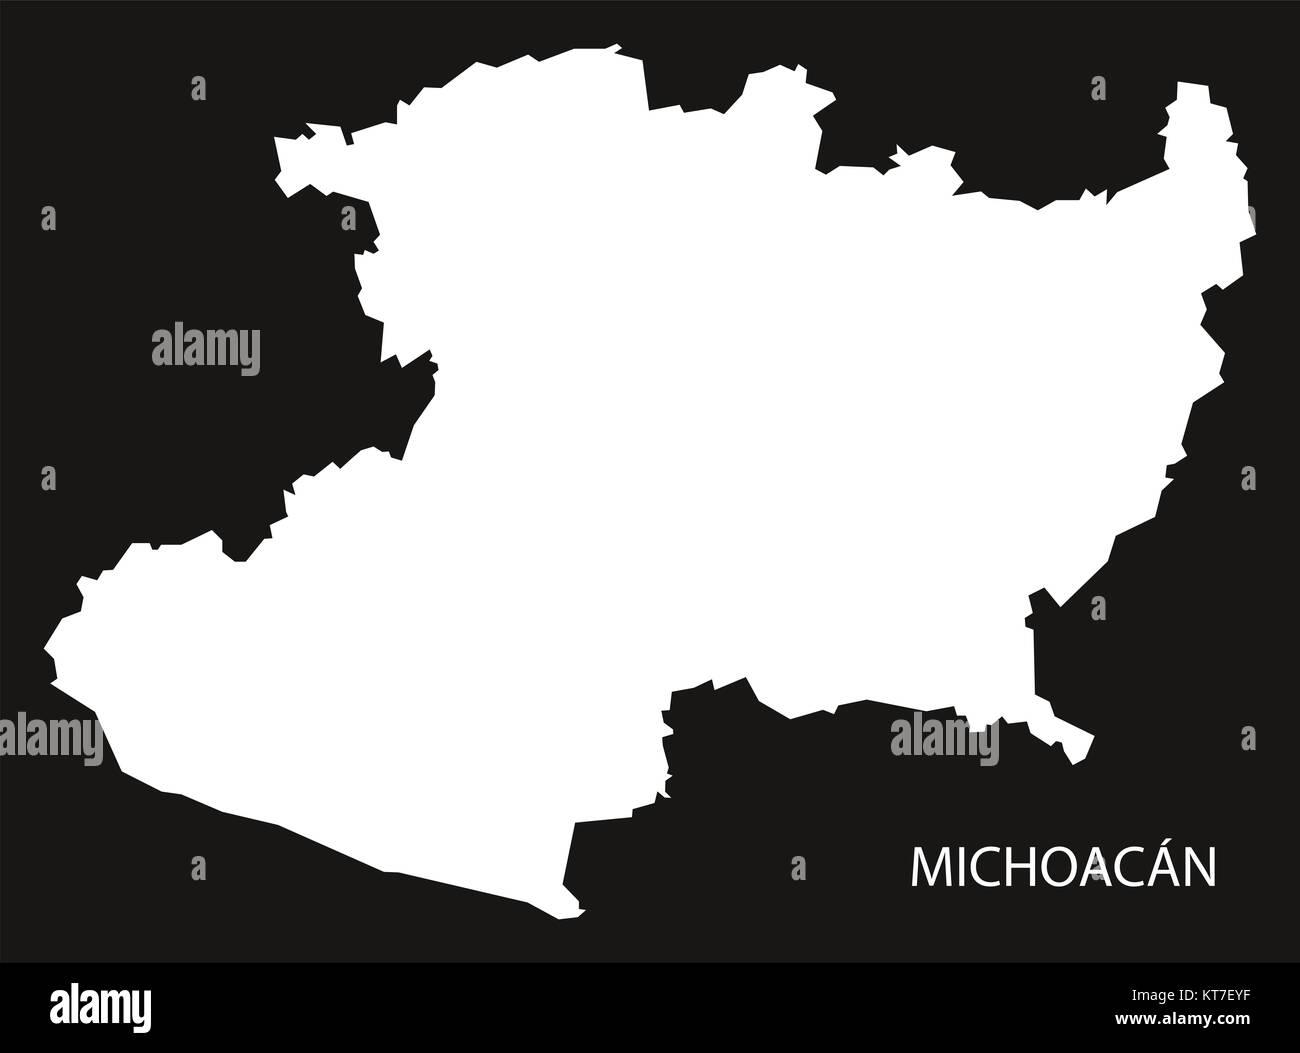 Michoacan Mexico Map Black Inverted Silhouette Stock Photo